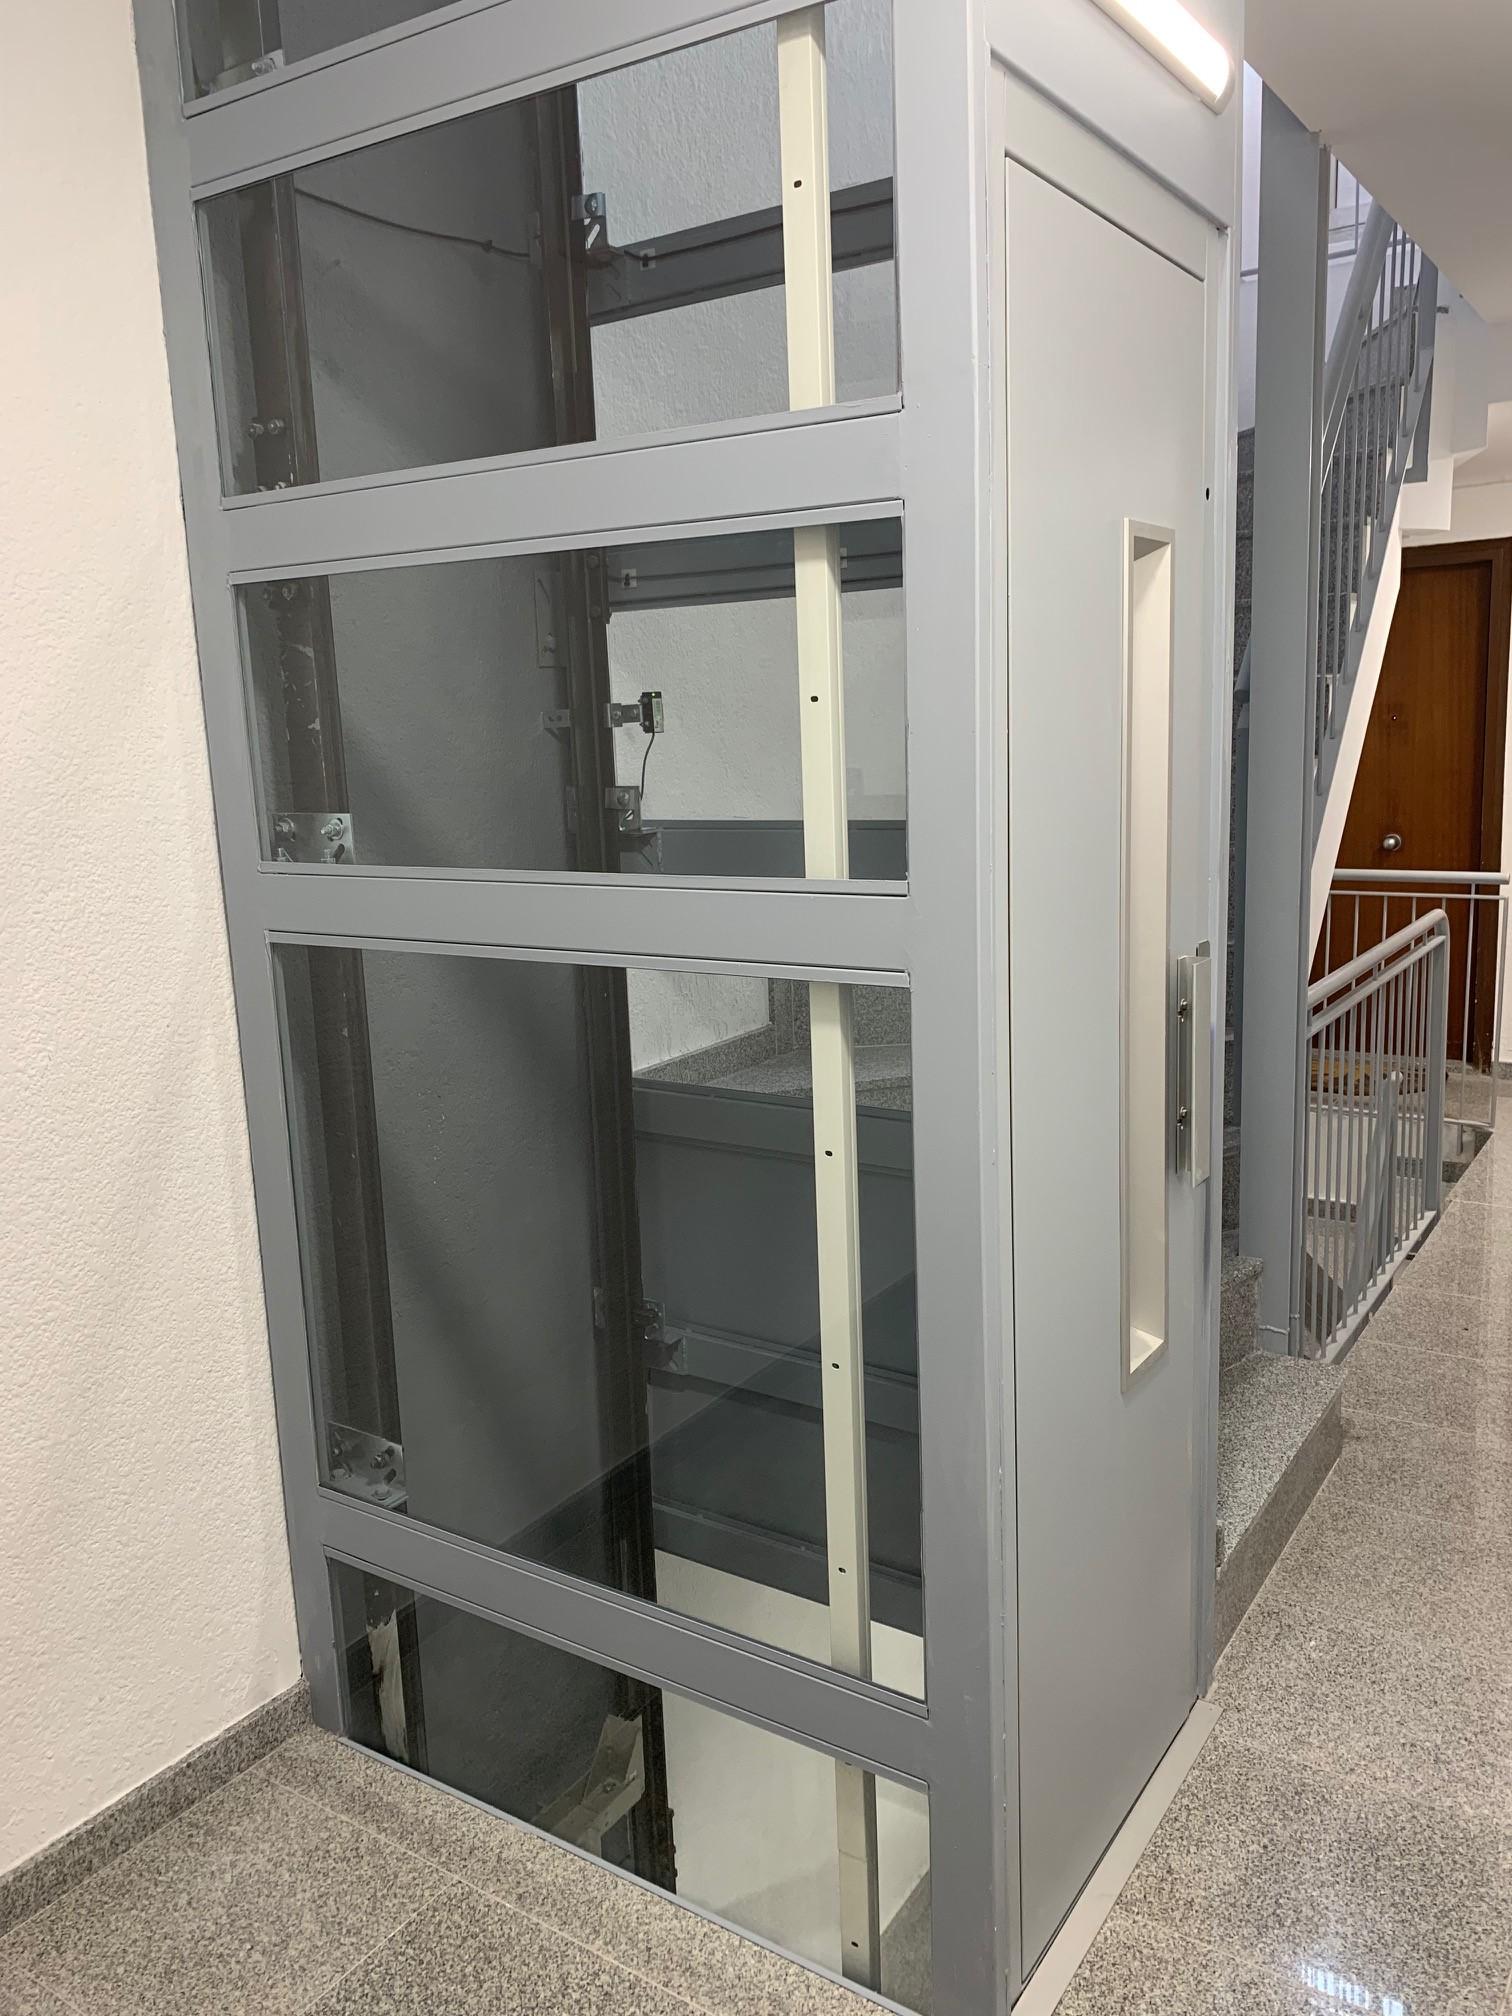 Instalación de ascensor oleodinámico   Ascensores Ramase